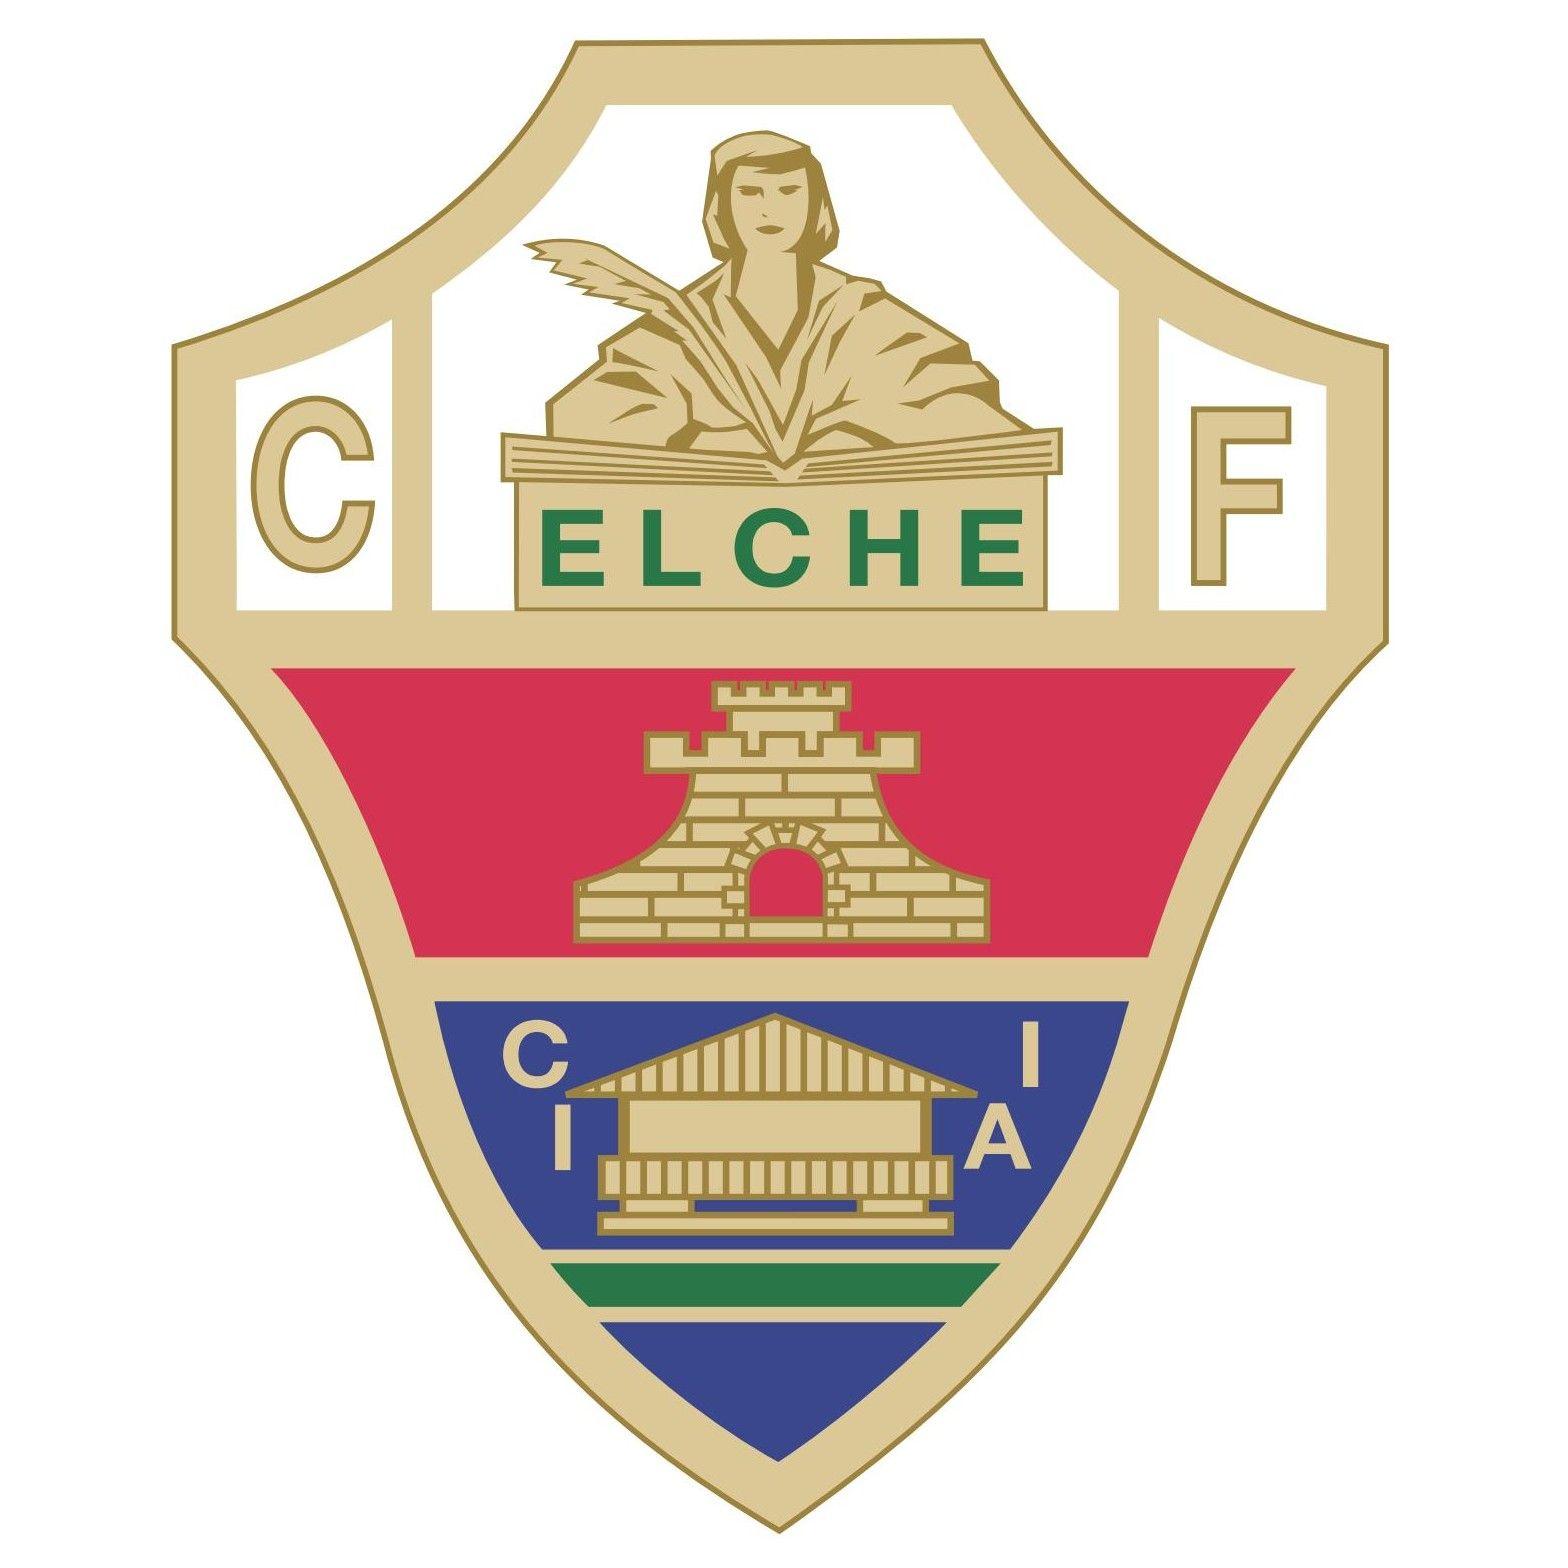 Elche Cf Logo Vector Free Logo Eps Download Football Team Logos Football Logo Soccer Logo Elche c f logo sport hd wallpaper